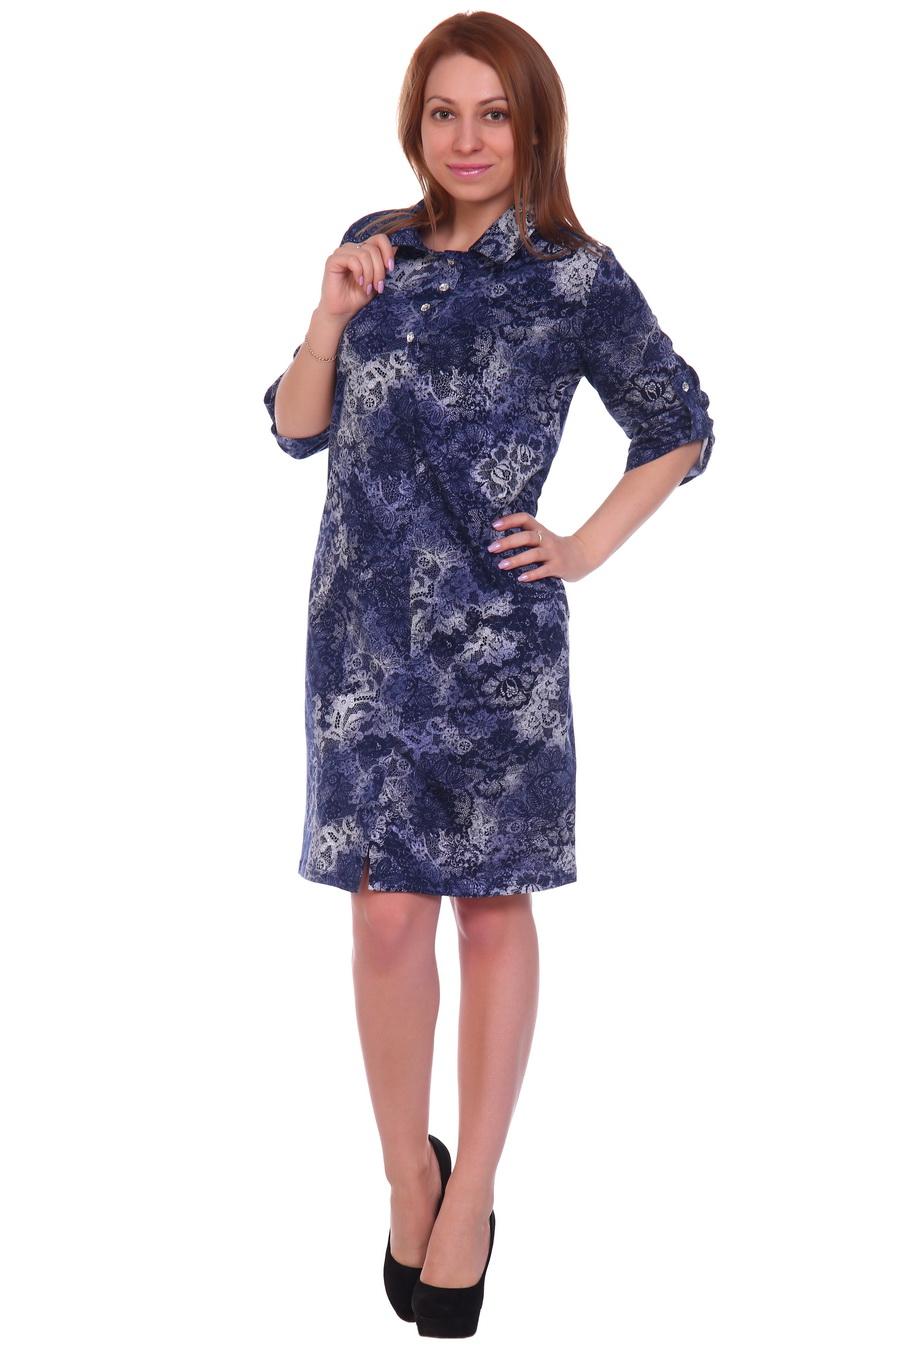 Жен. платье арт. 17-0114 Темно-синий р. 50 фото